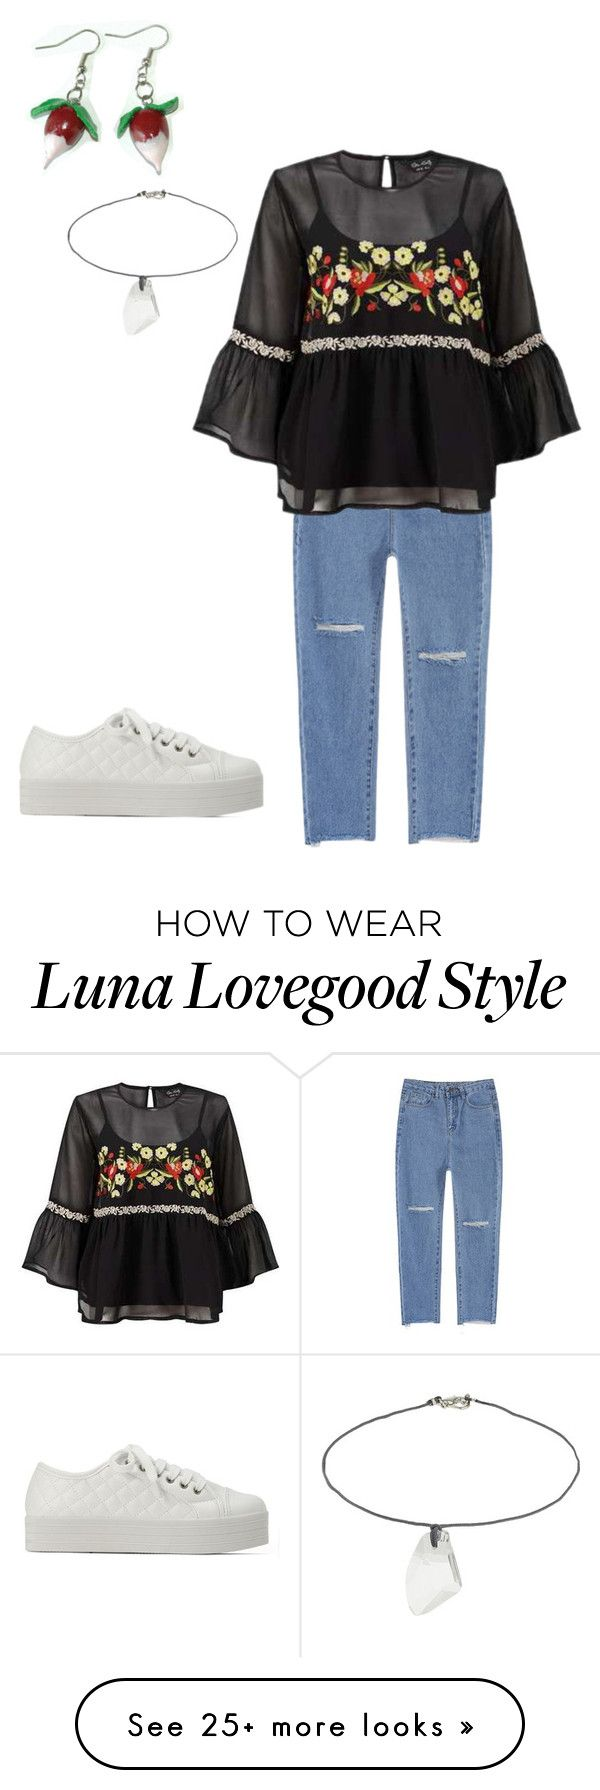 """modern day luna lovegood inspired look"" by jennikat on Polyvore featuring Luna, Miss Selfridge, Topshop and modern"